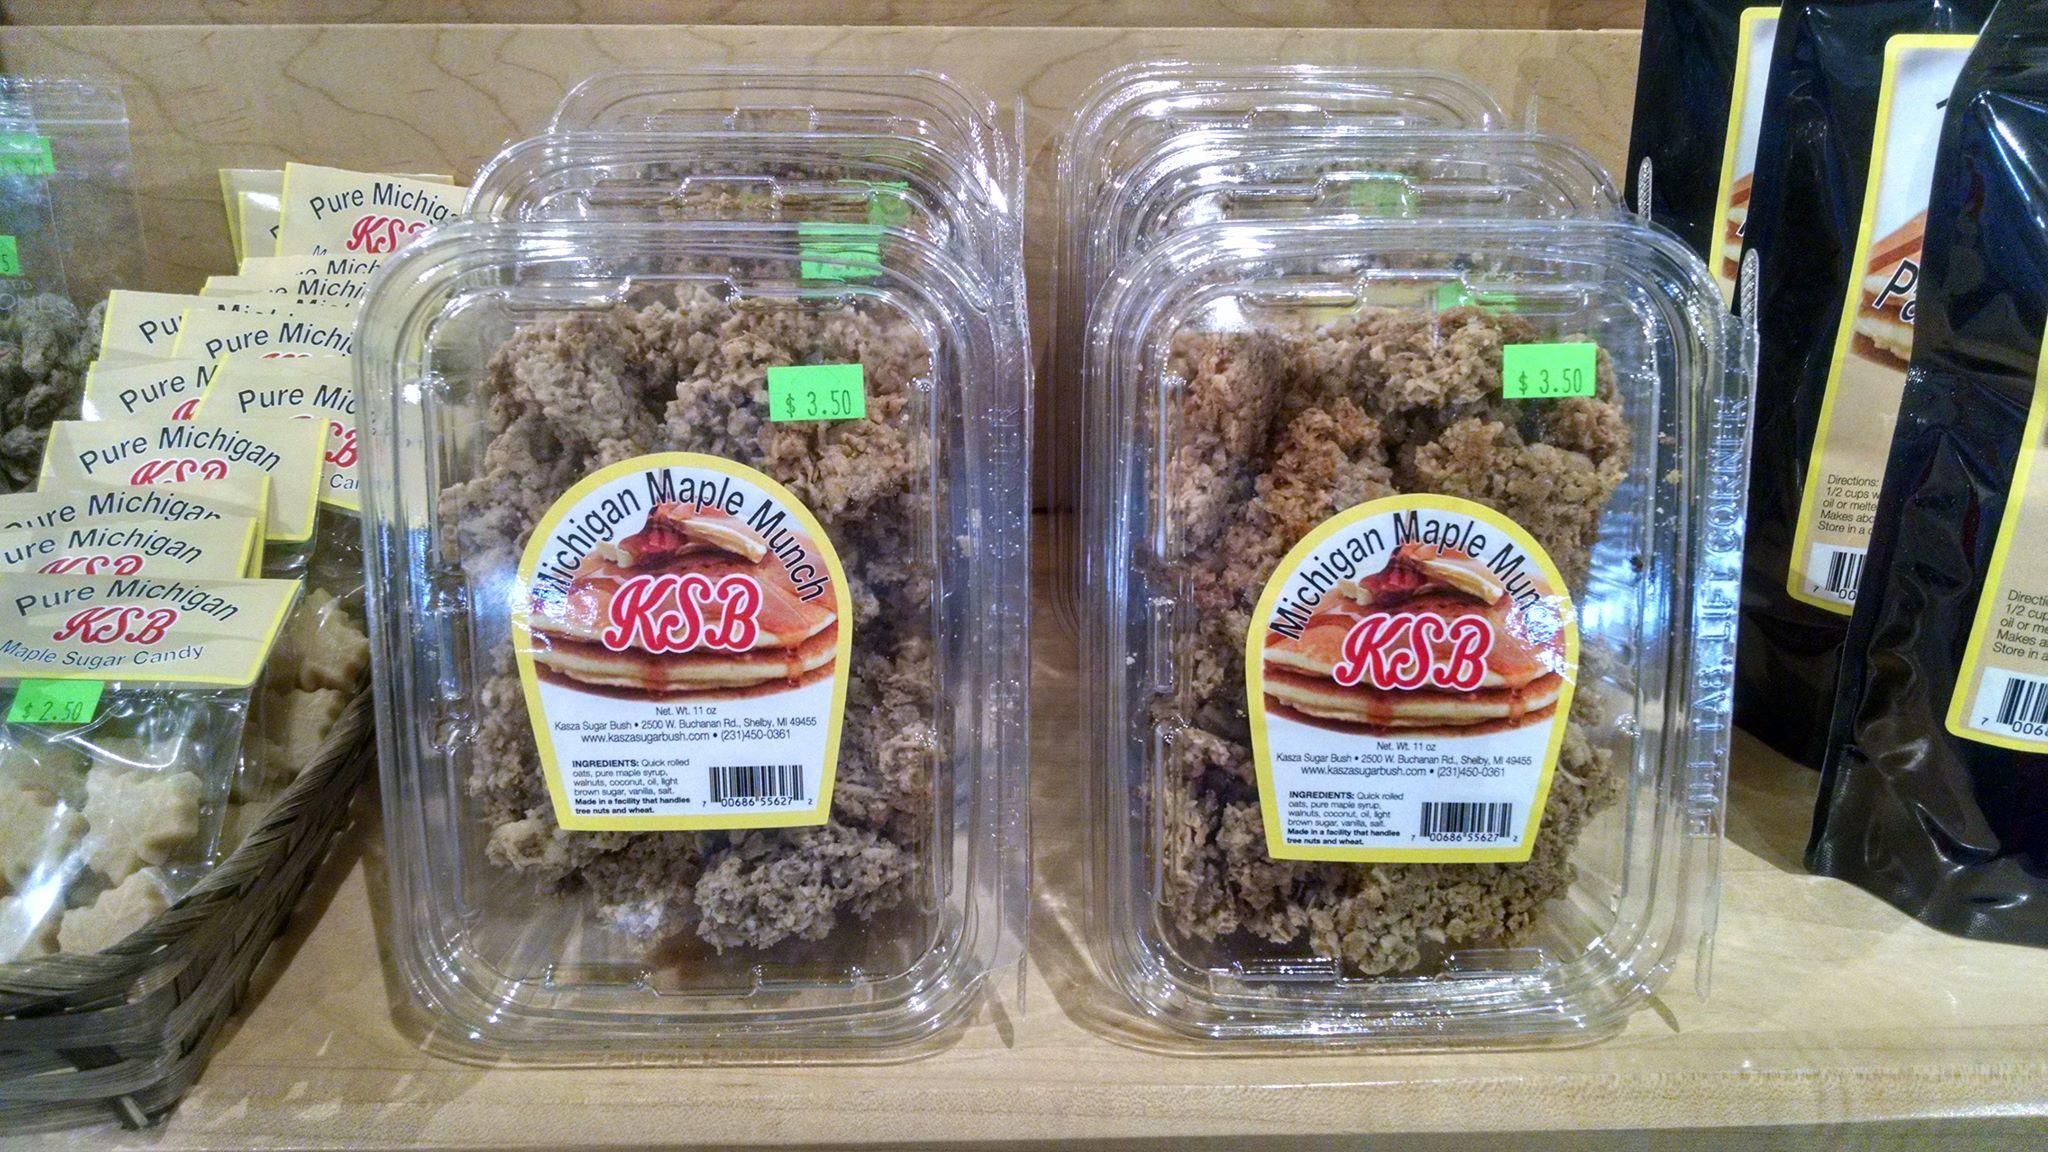 Kasza Sugar Bush image 5